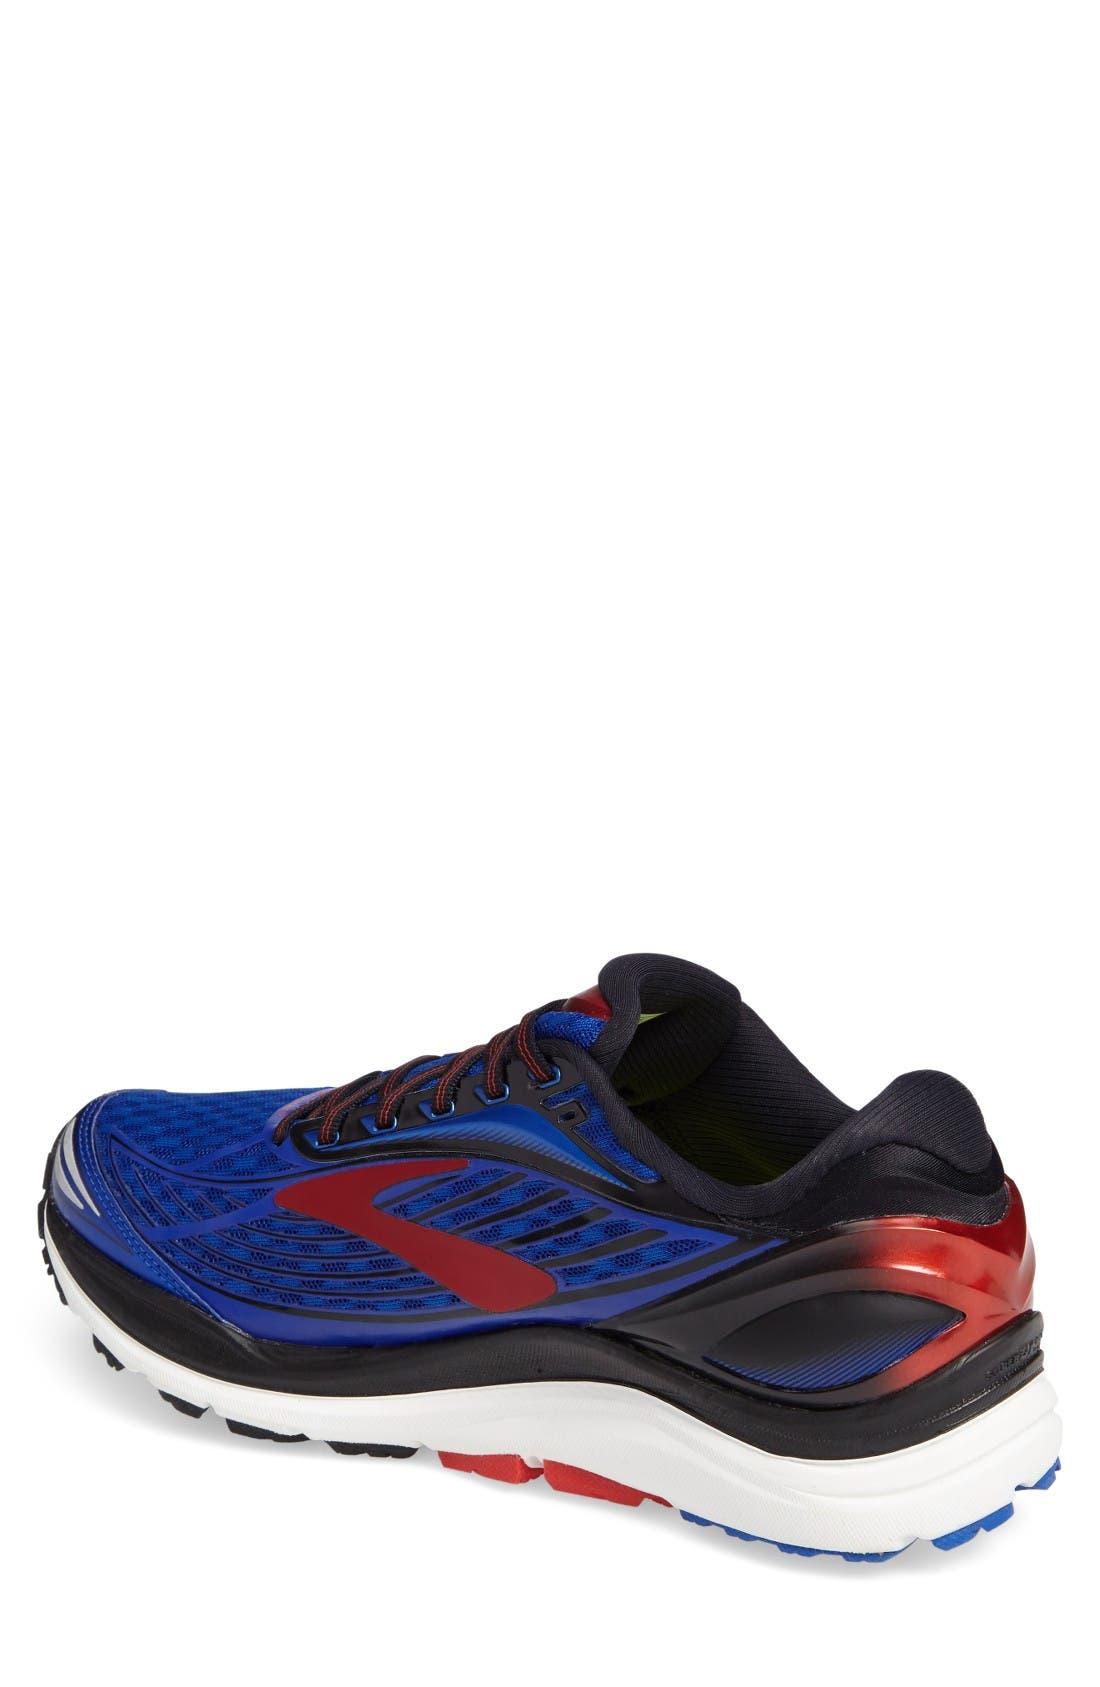 Transcend 4 Running Shoe,                             Alternate thumbnail 2, color,                             Blue/ Black/ Red